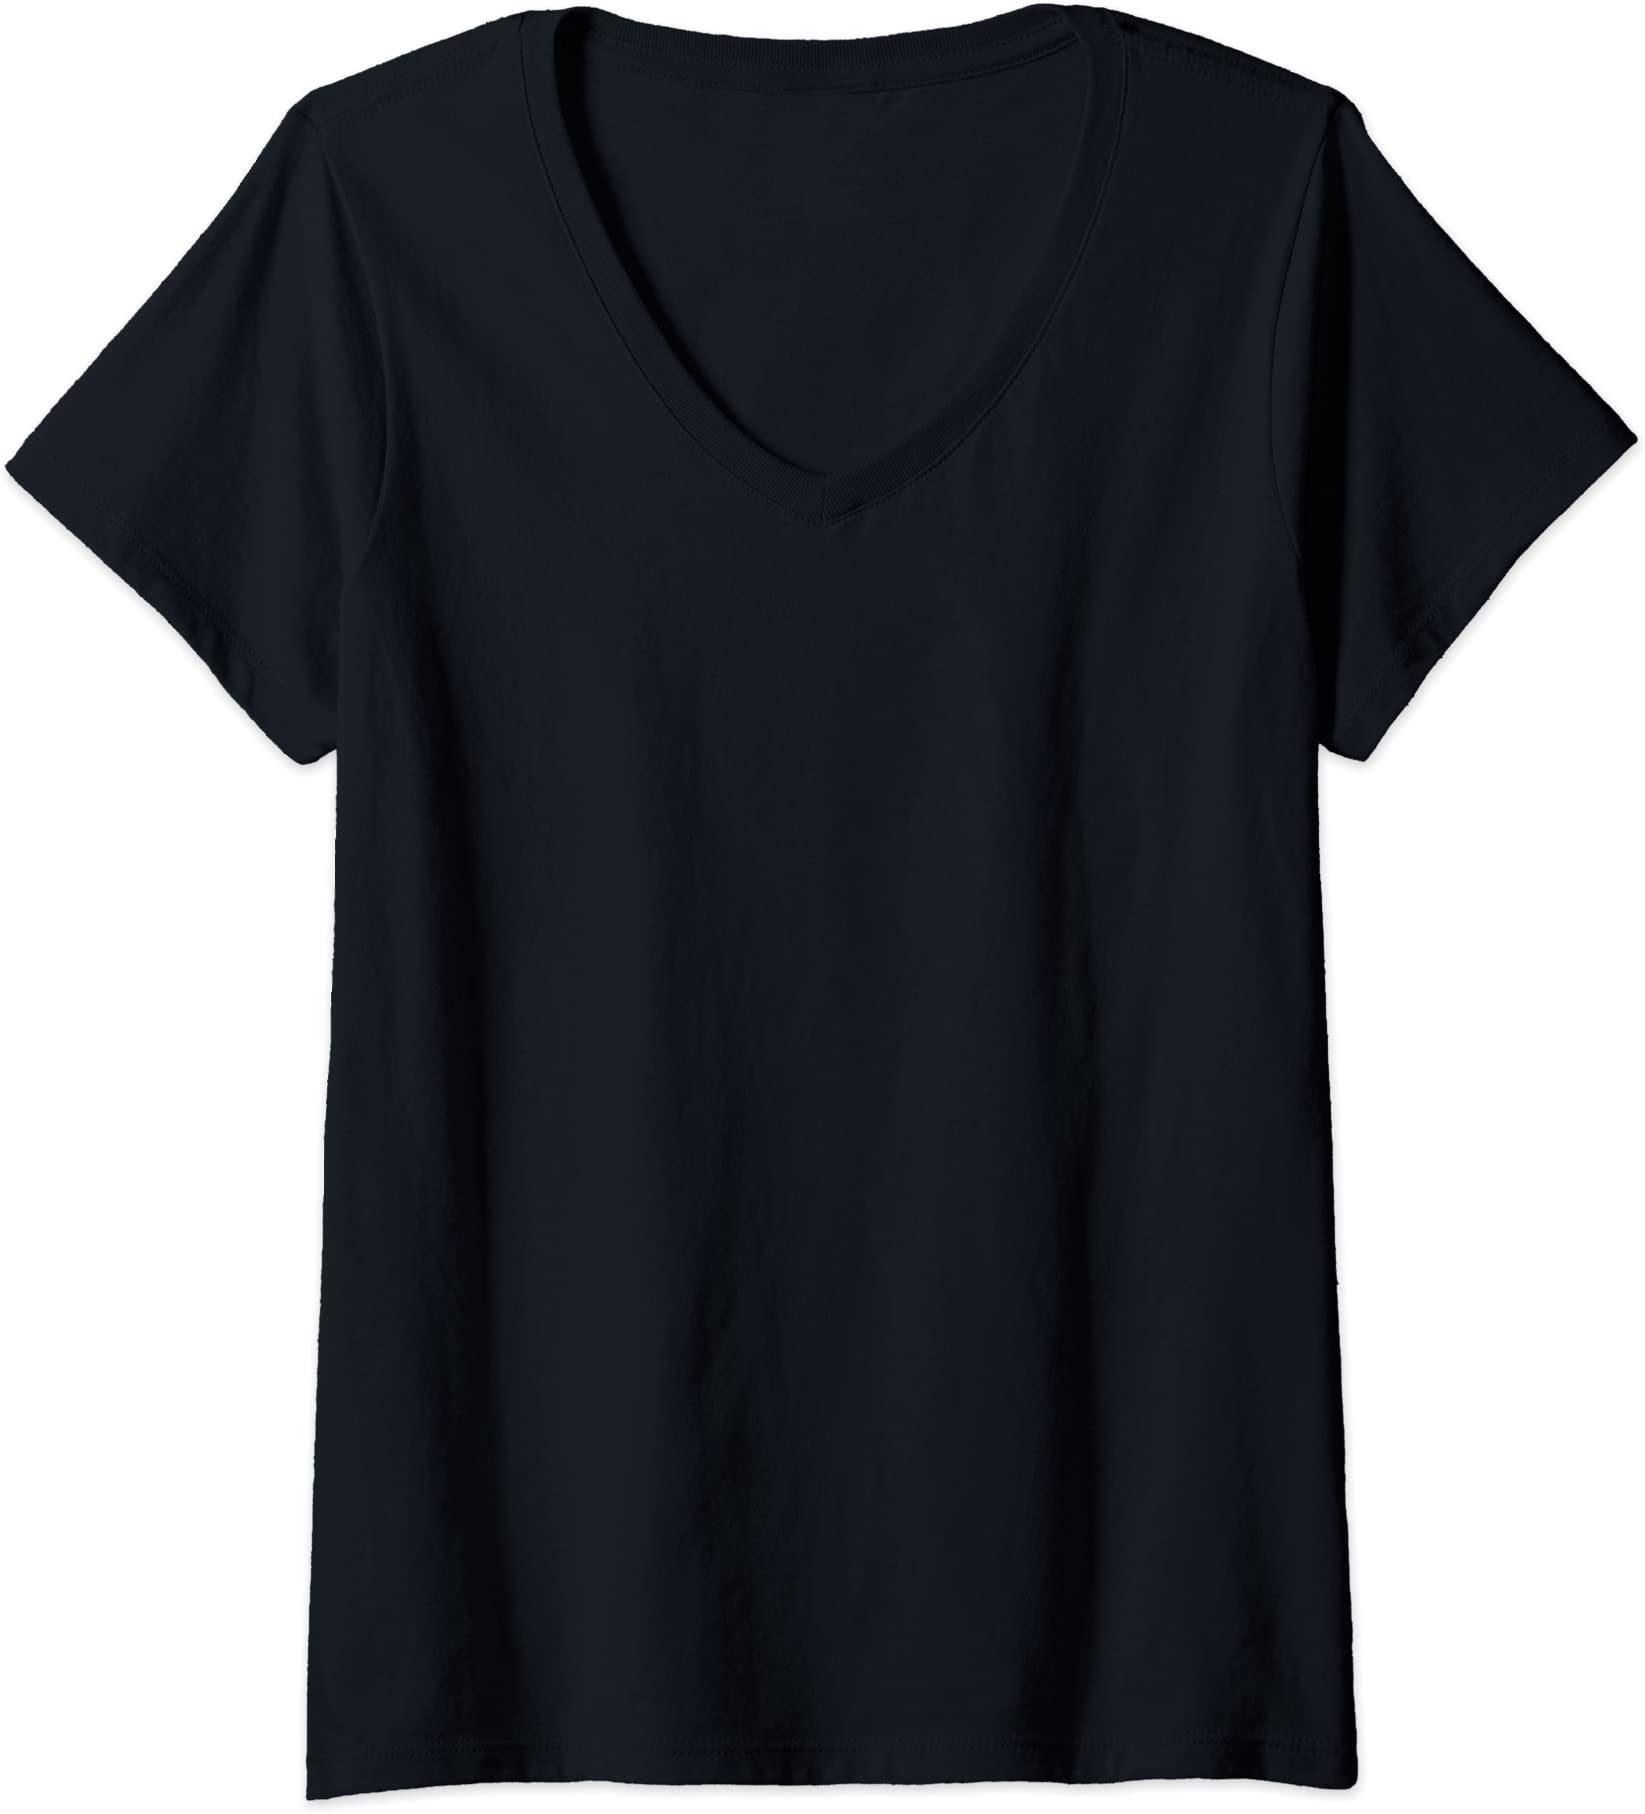 Harry Potter MISCHIEF MANAGED 4 Licensed BOYS /& GIRLS T-Shirt S-XL